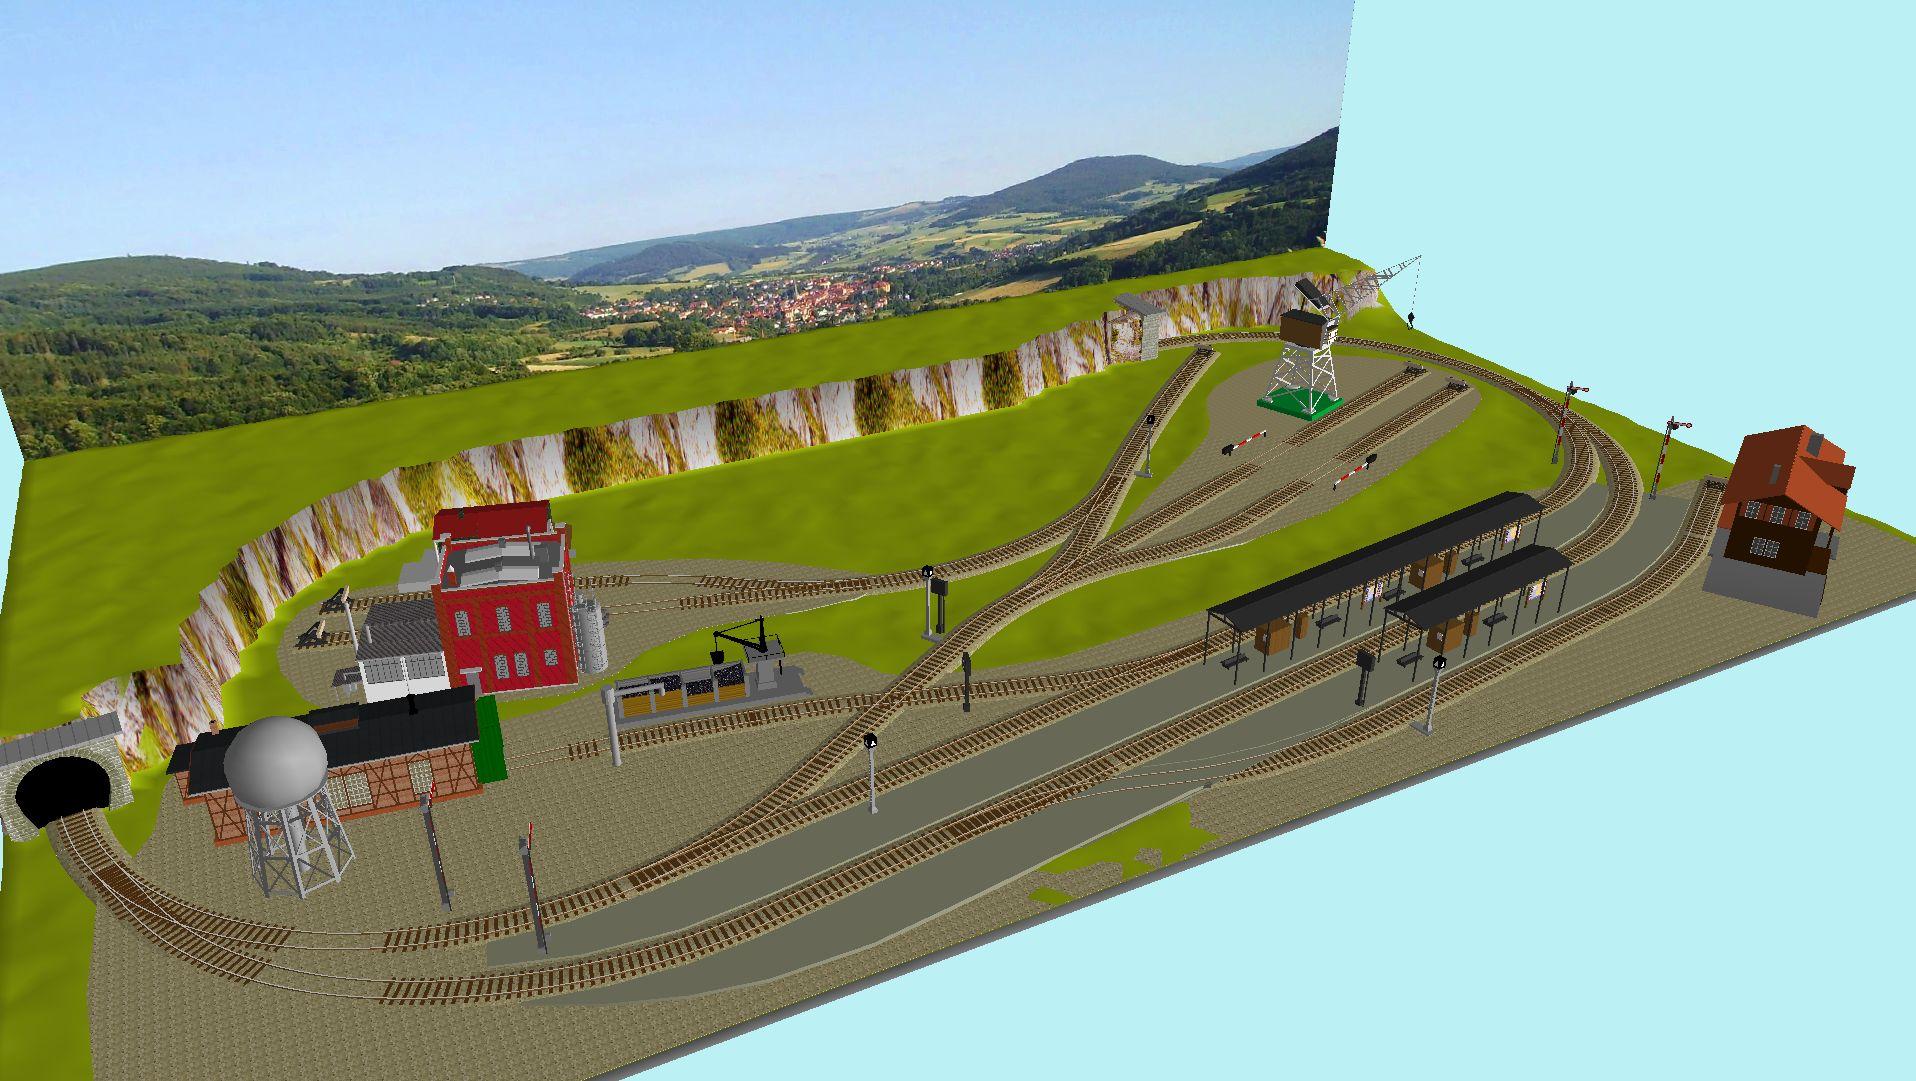 'ALBA Modellbahnpraxis' Band 1, Plan 5 Amp-1_5_m-gleis_jrg_0pekcb